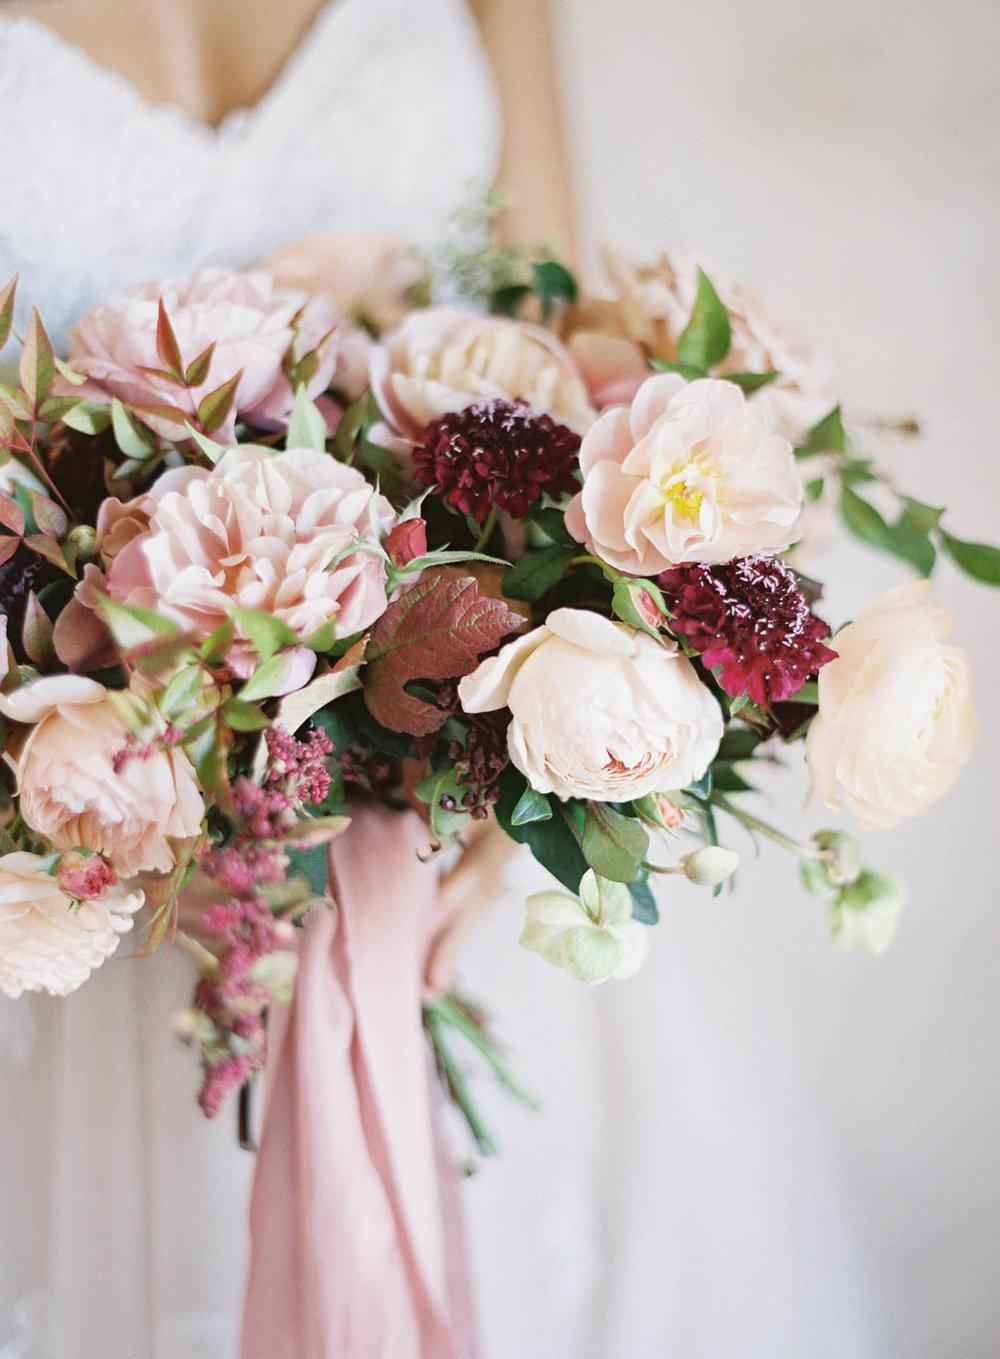 sunstone-villa-wedding-6-Jen_Huang-RD-28-Jen_Huang-009577-R1-007.jpg